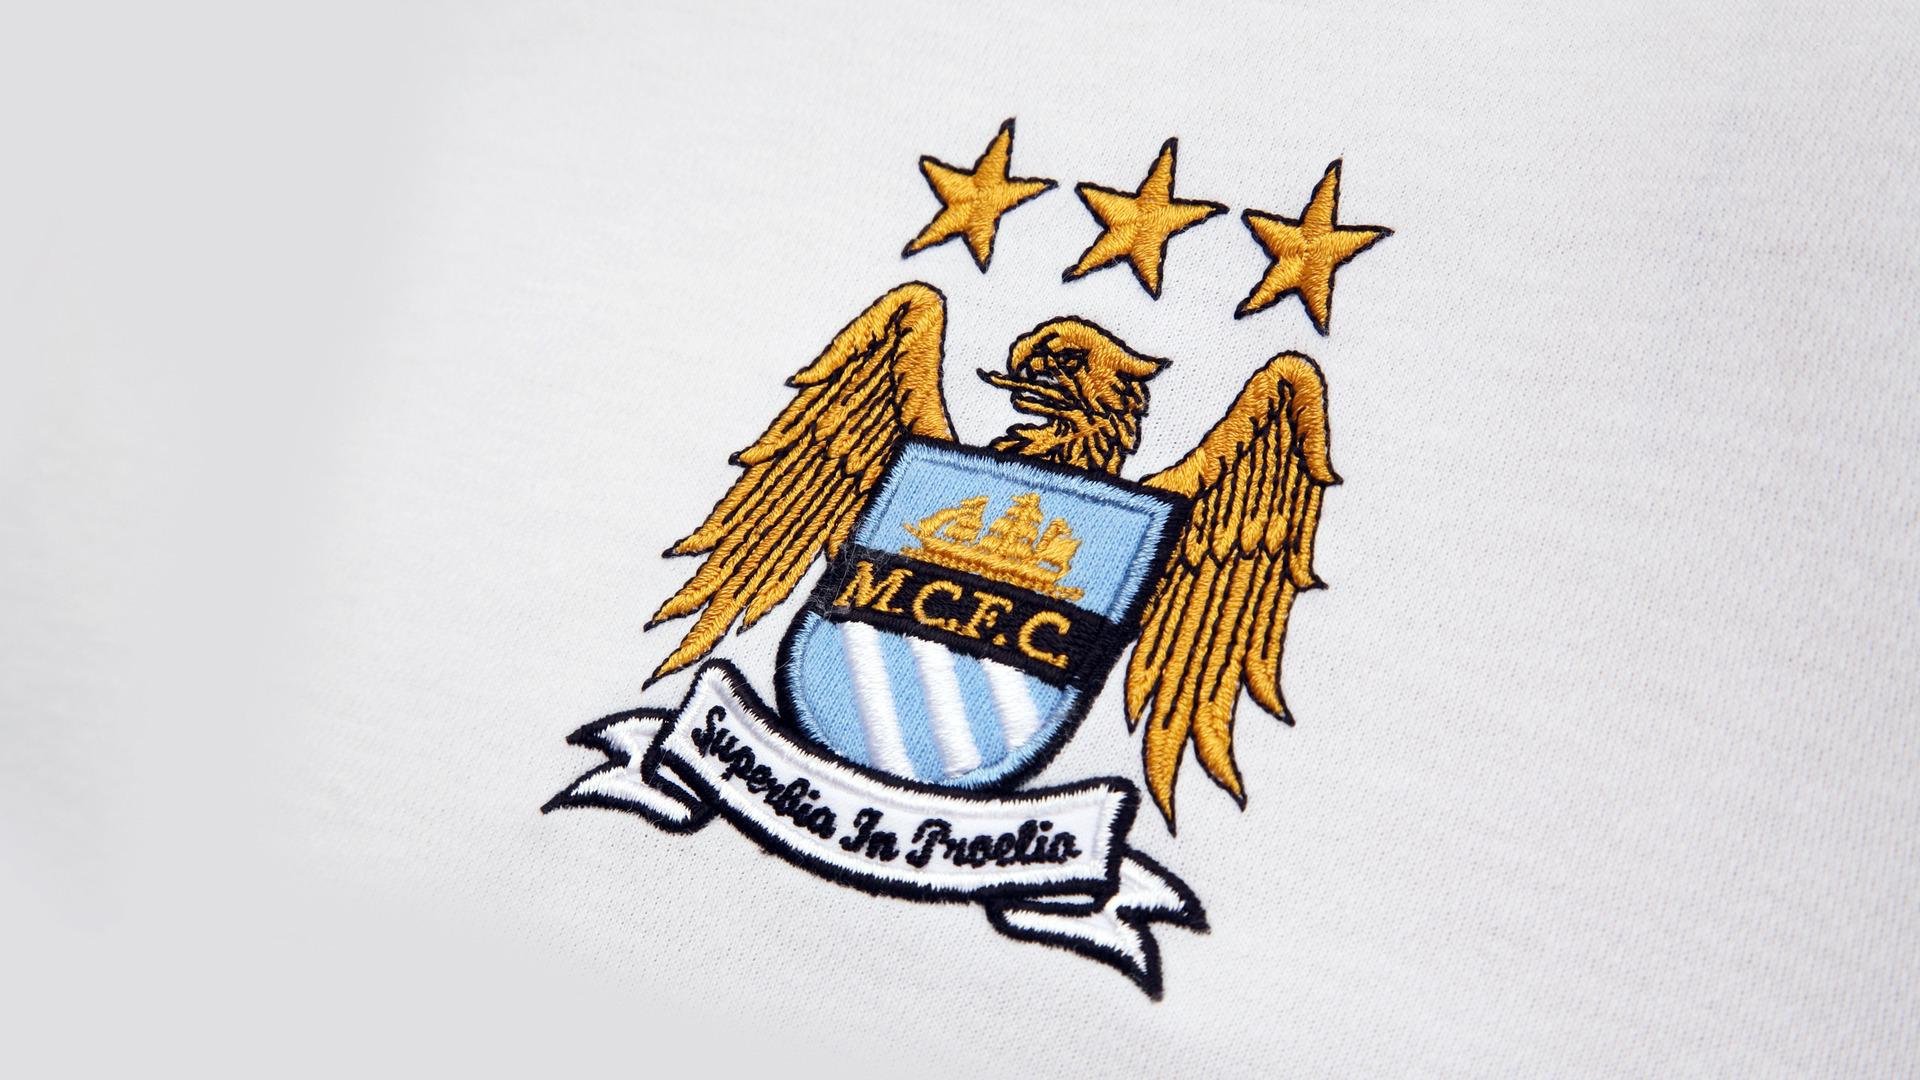 Manchester City 3d Image